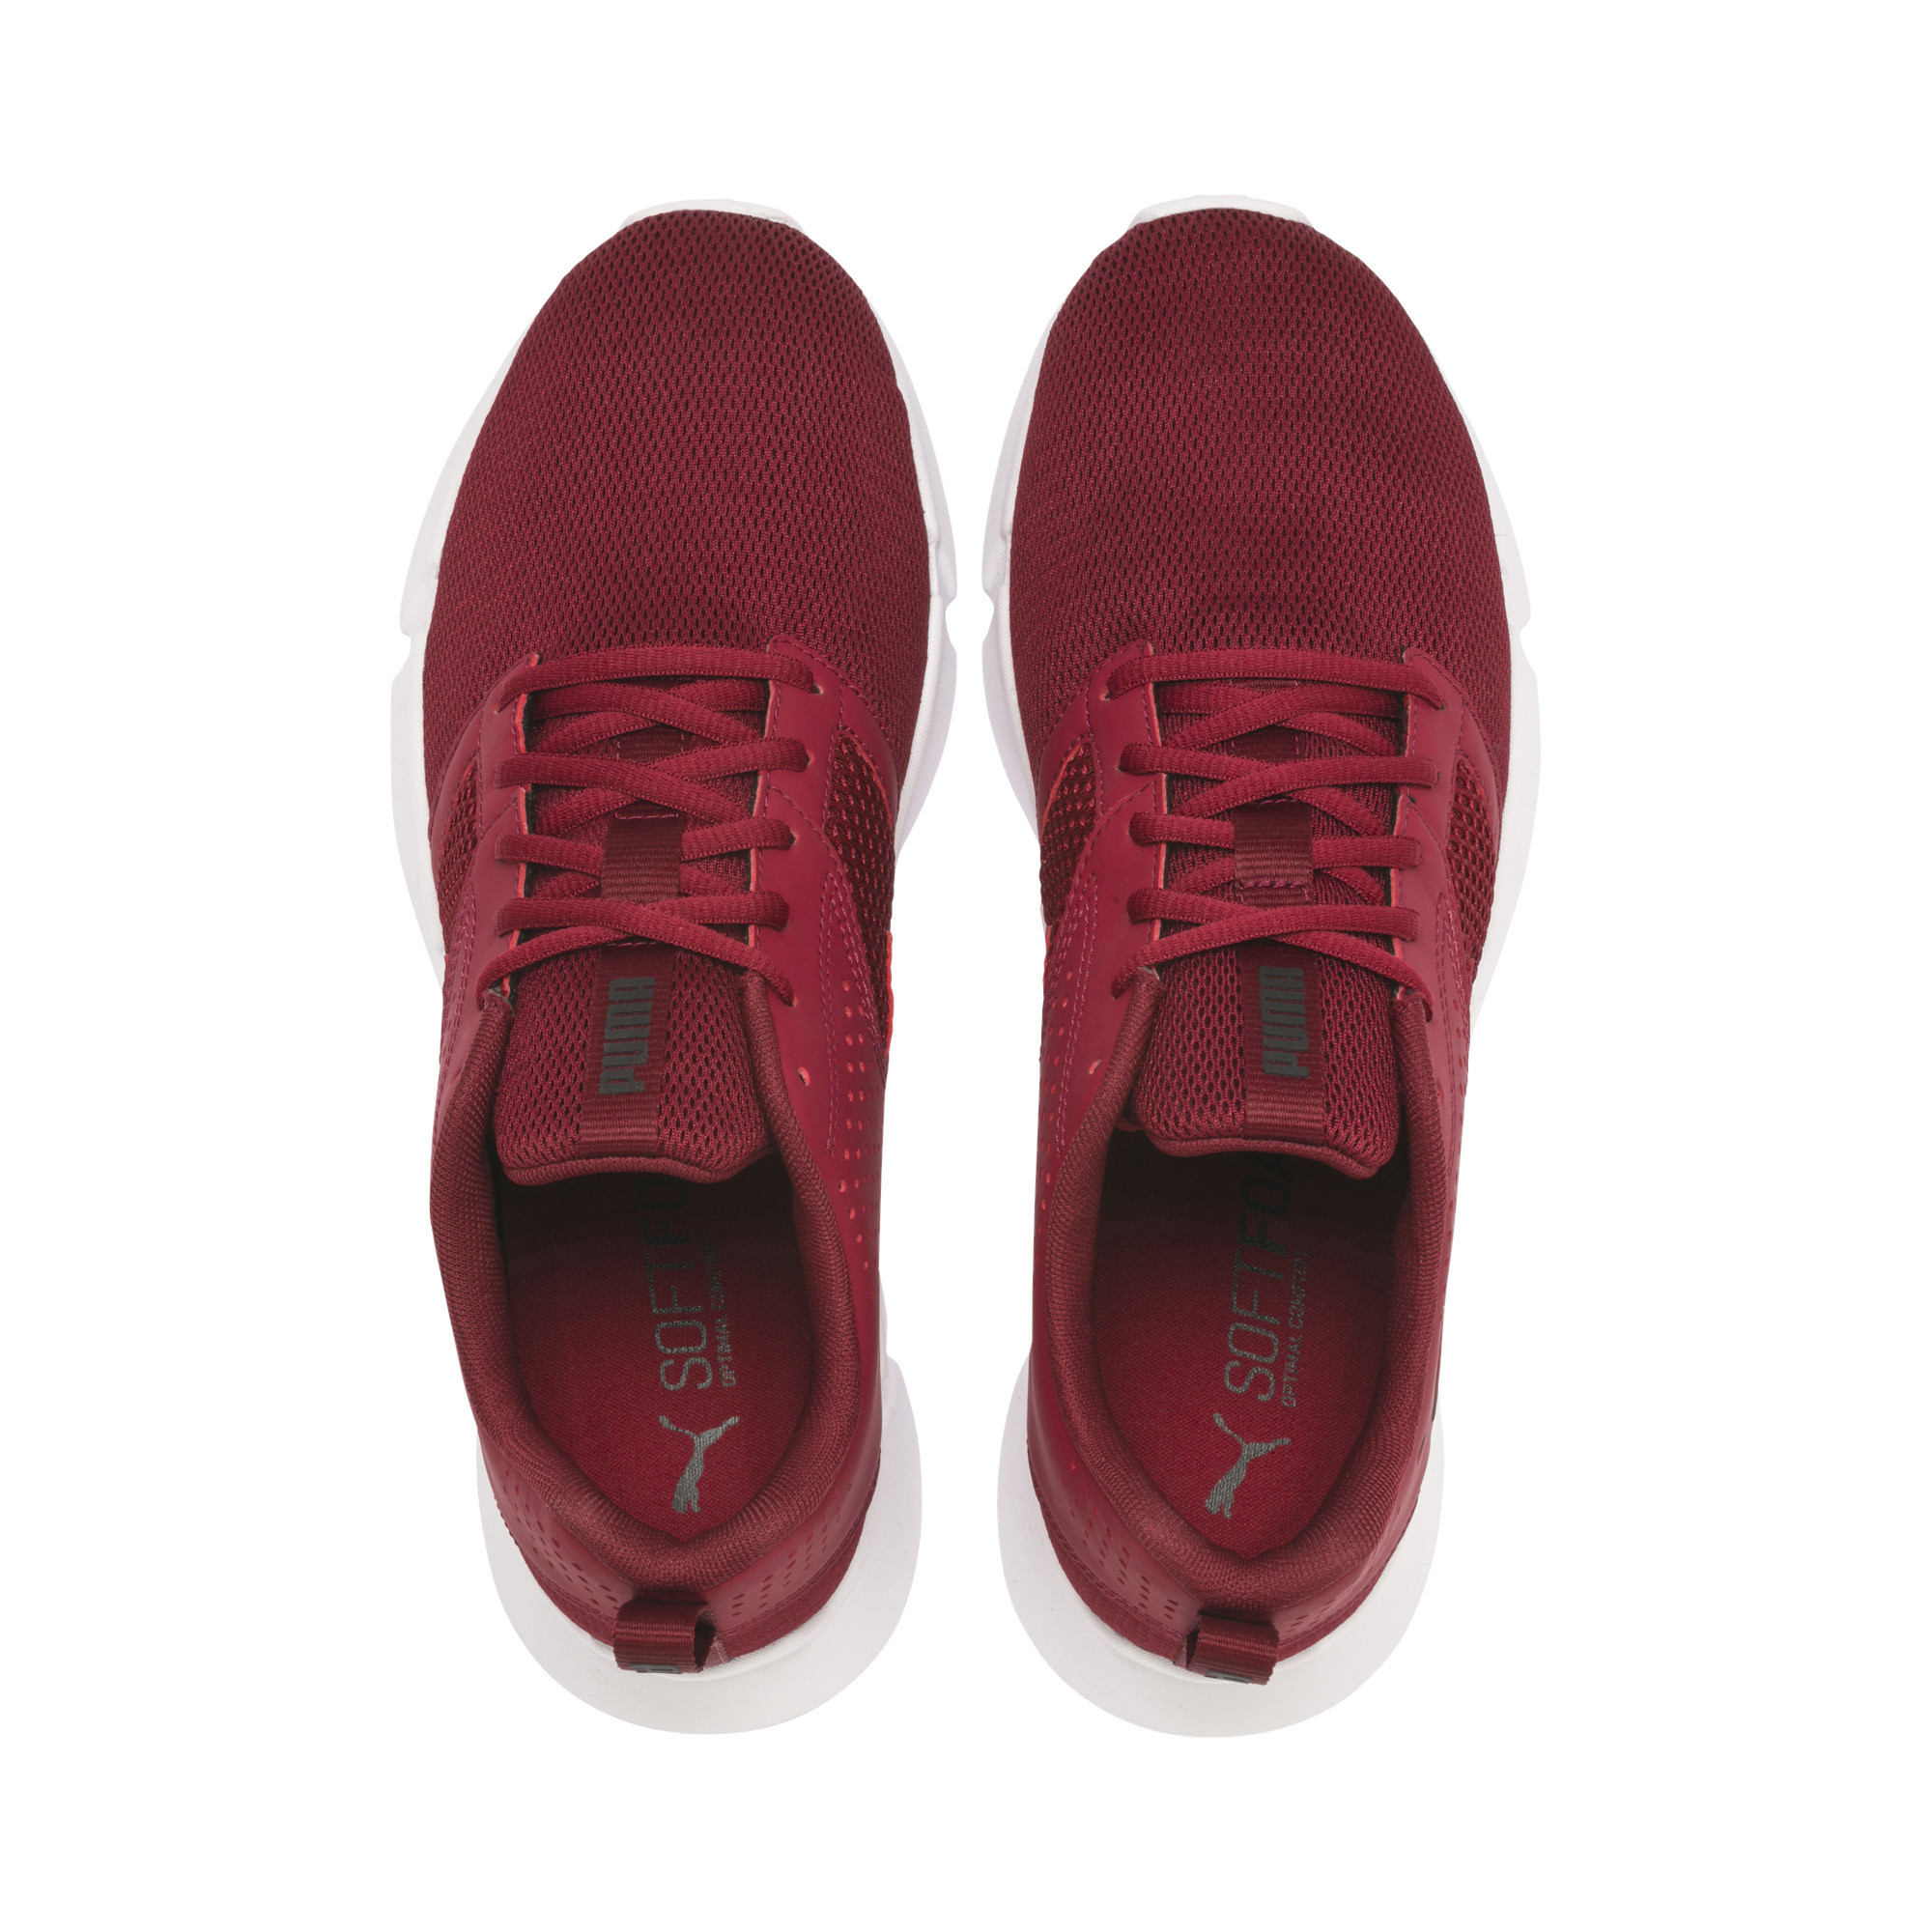 PUMA-INTERFLEX-Modern-Men-039-s-Sneakers-Unisex-Shoe-Running thumbnail 25